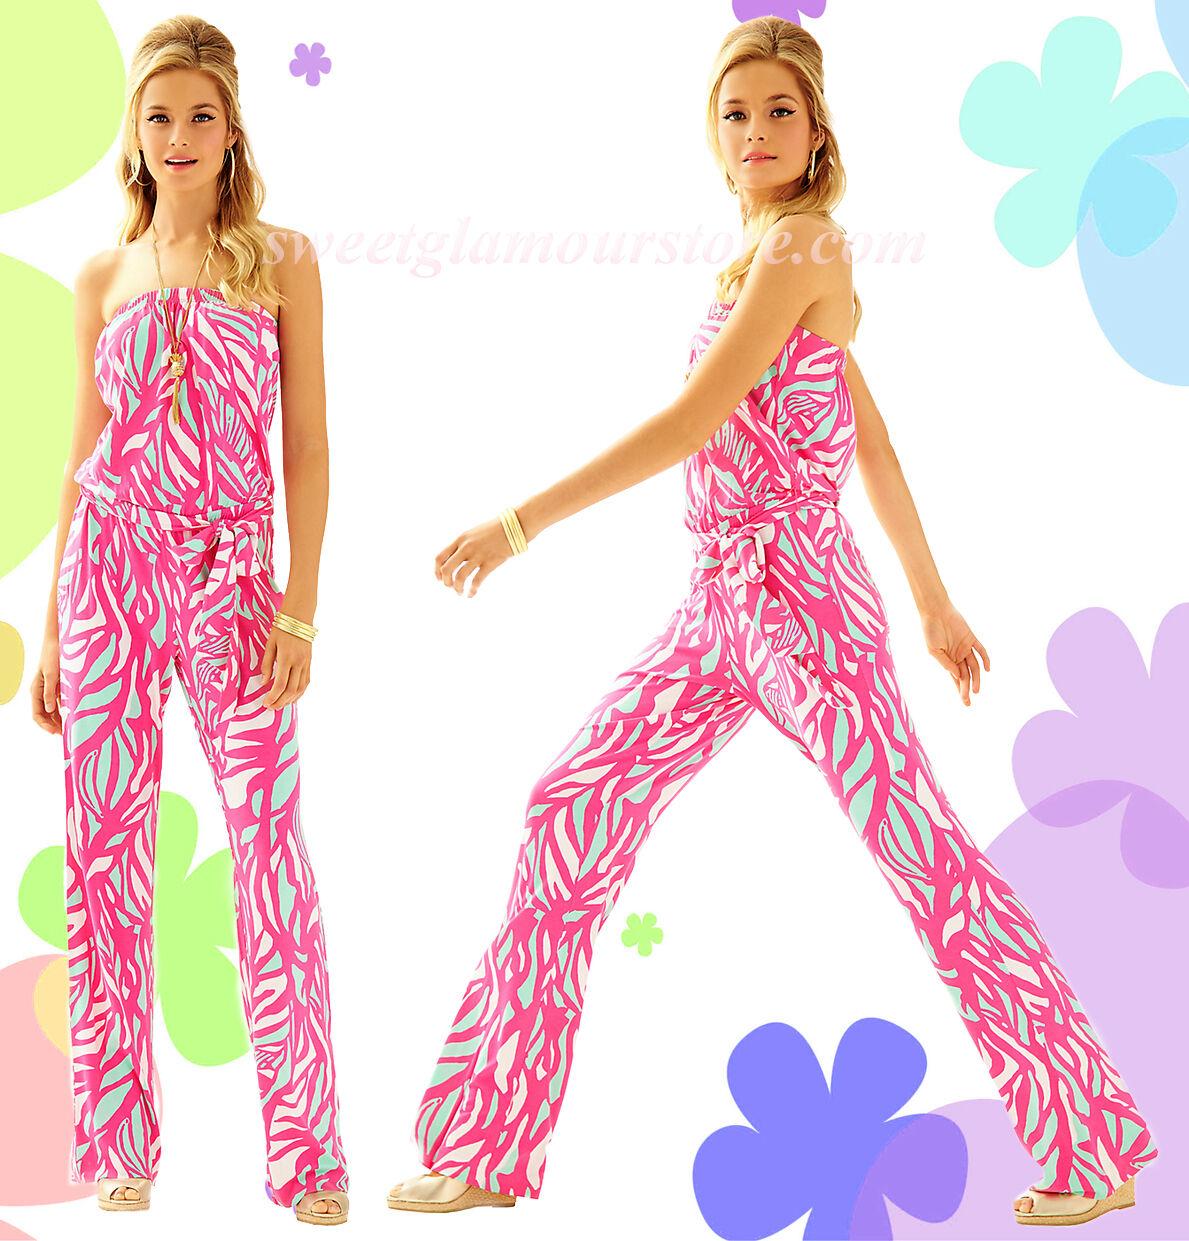 178 Lilly Pulitzer Tia Capri Pink Papaya Playa Jersey Strapless Belted Jumpsuit